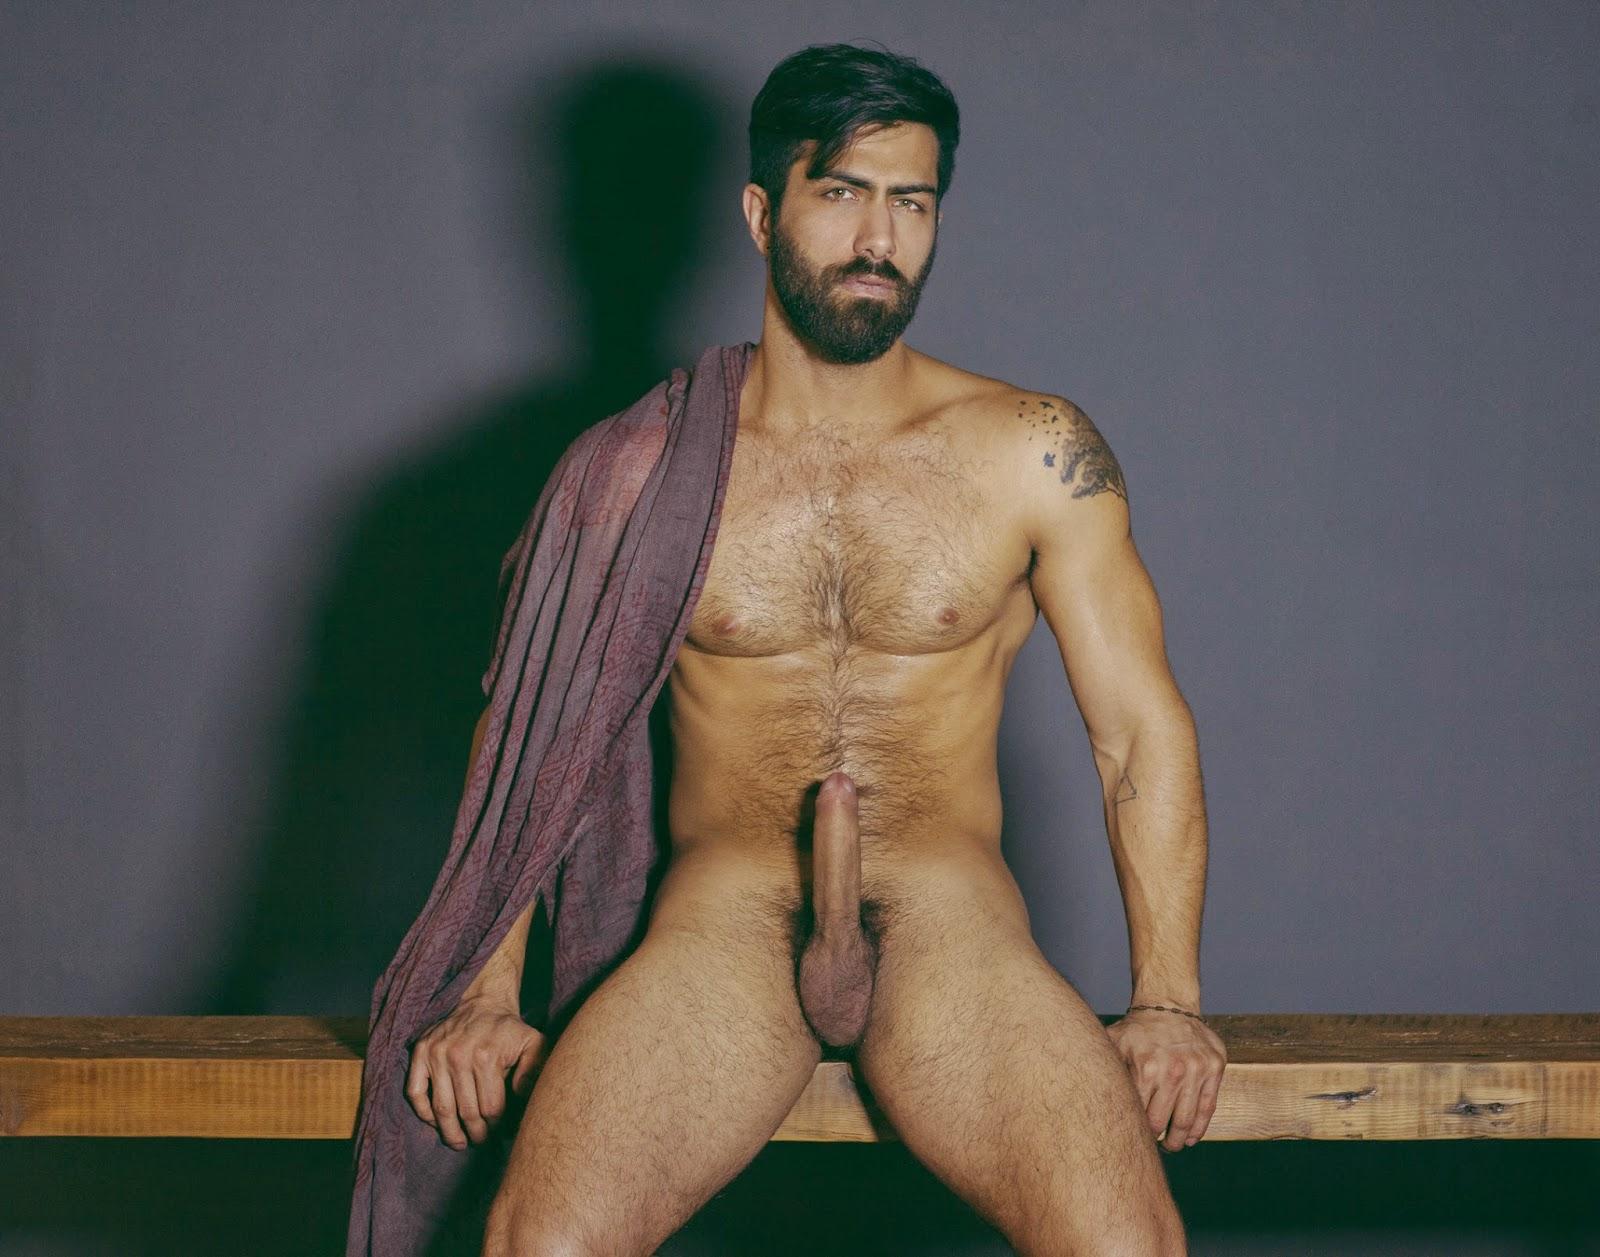 Adam Ramzi Nova Sensacao Do Porno Gay Iii Adam Ramzi New Sensation Of Gay Porn Iii